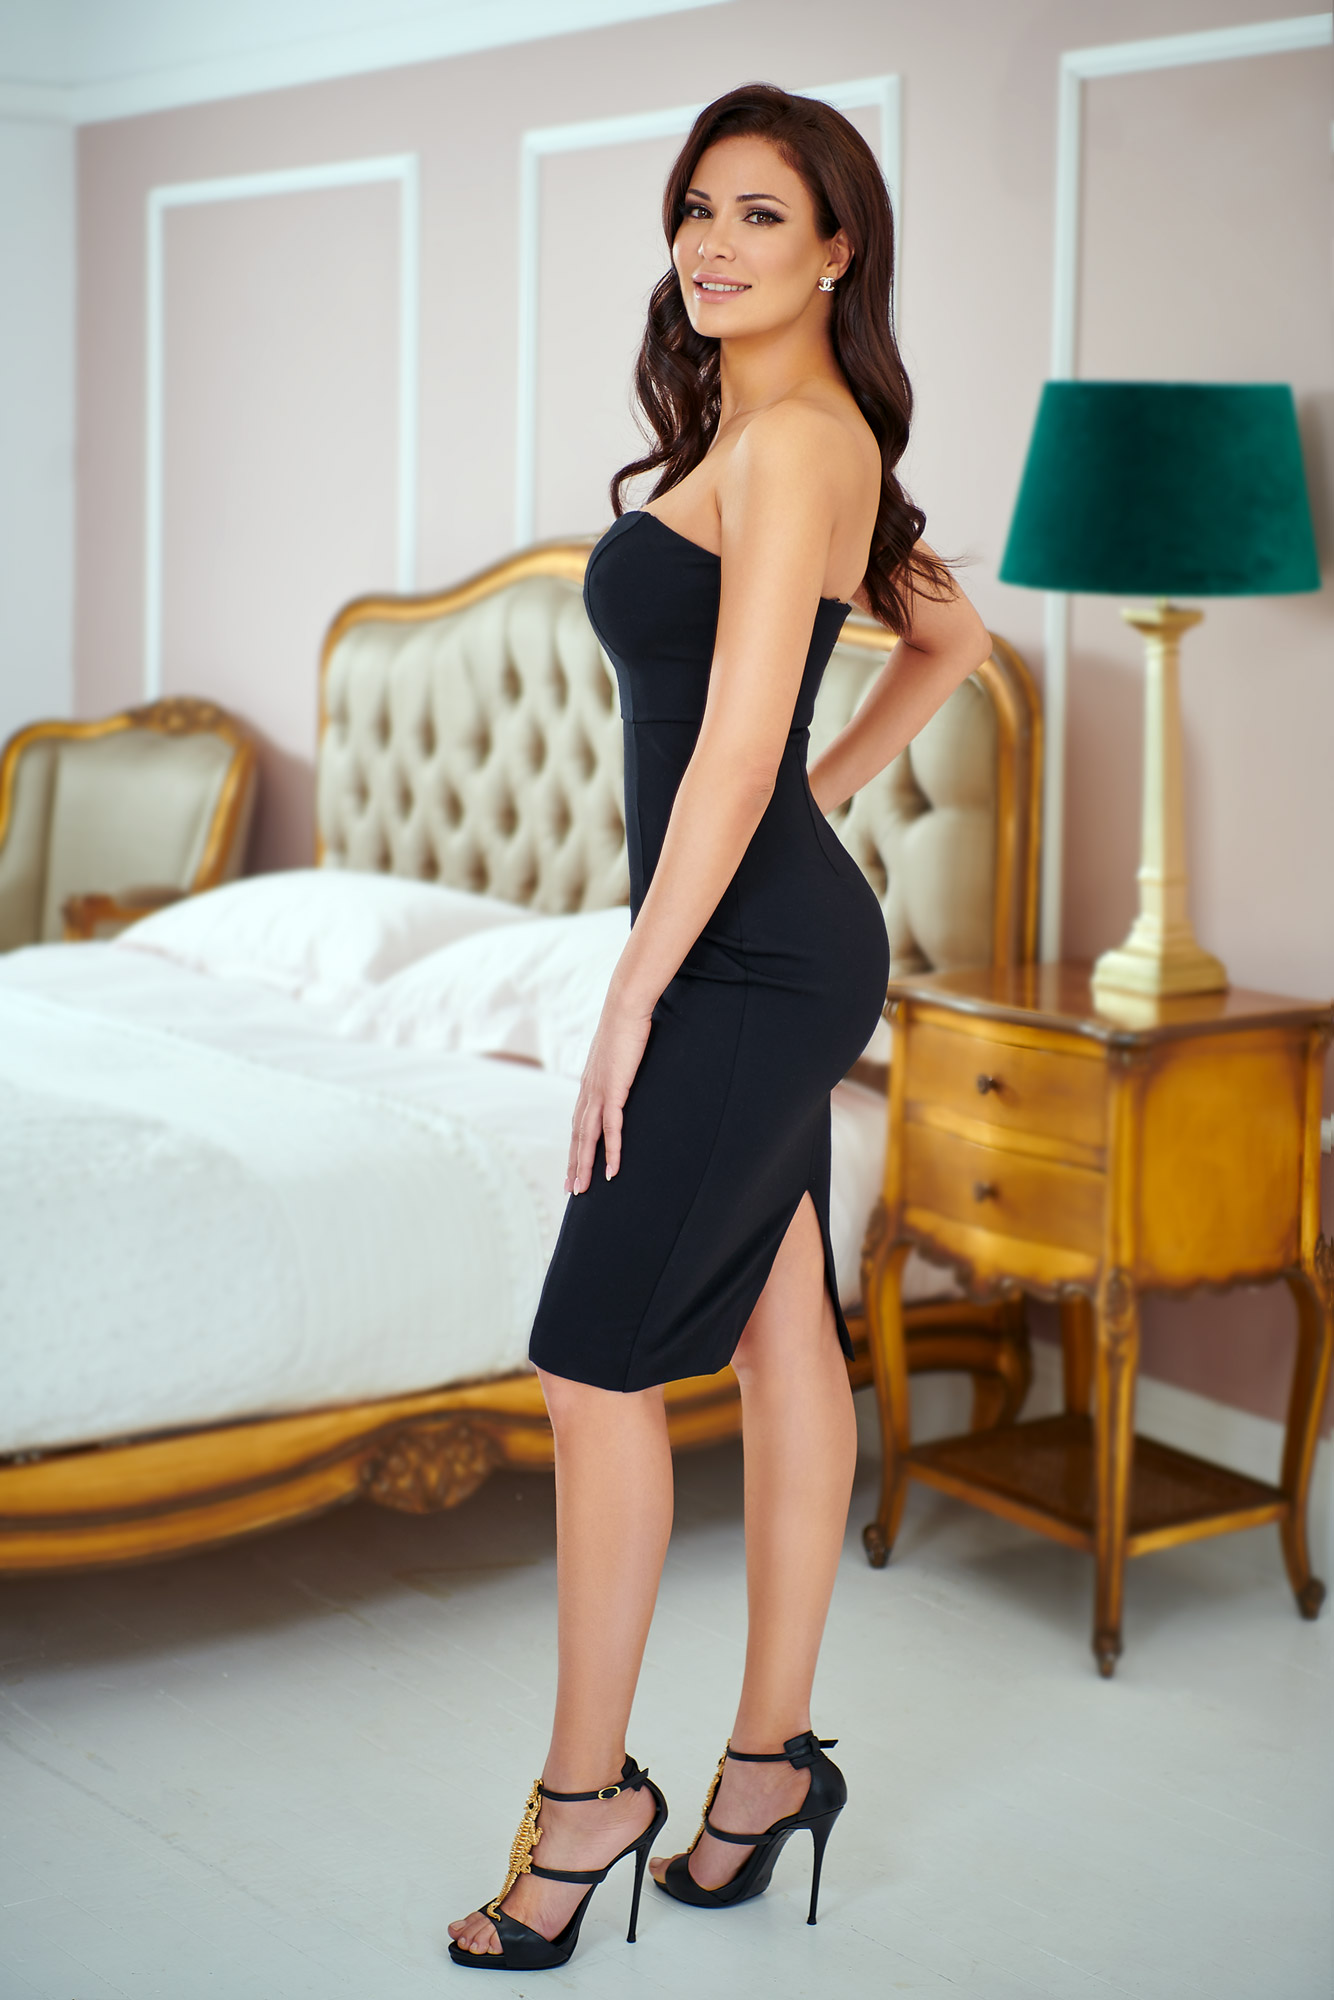 claudia-escort-milano-vip-geneva-agency.jpg